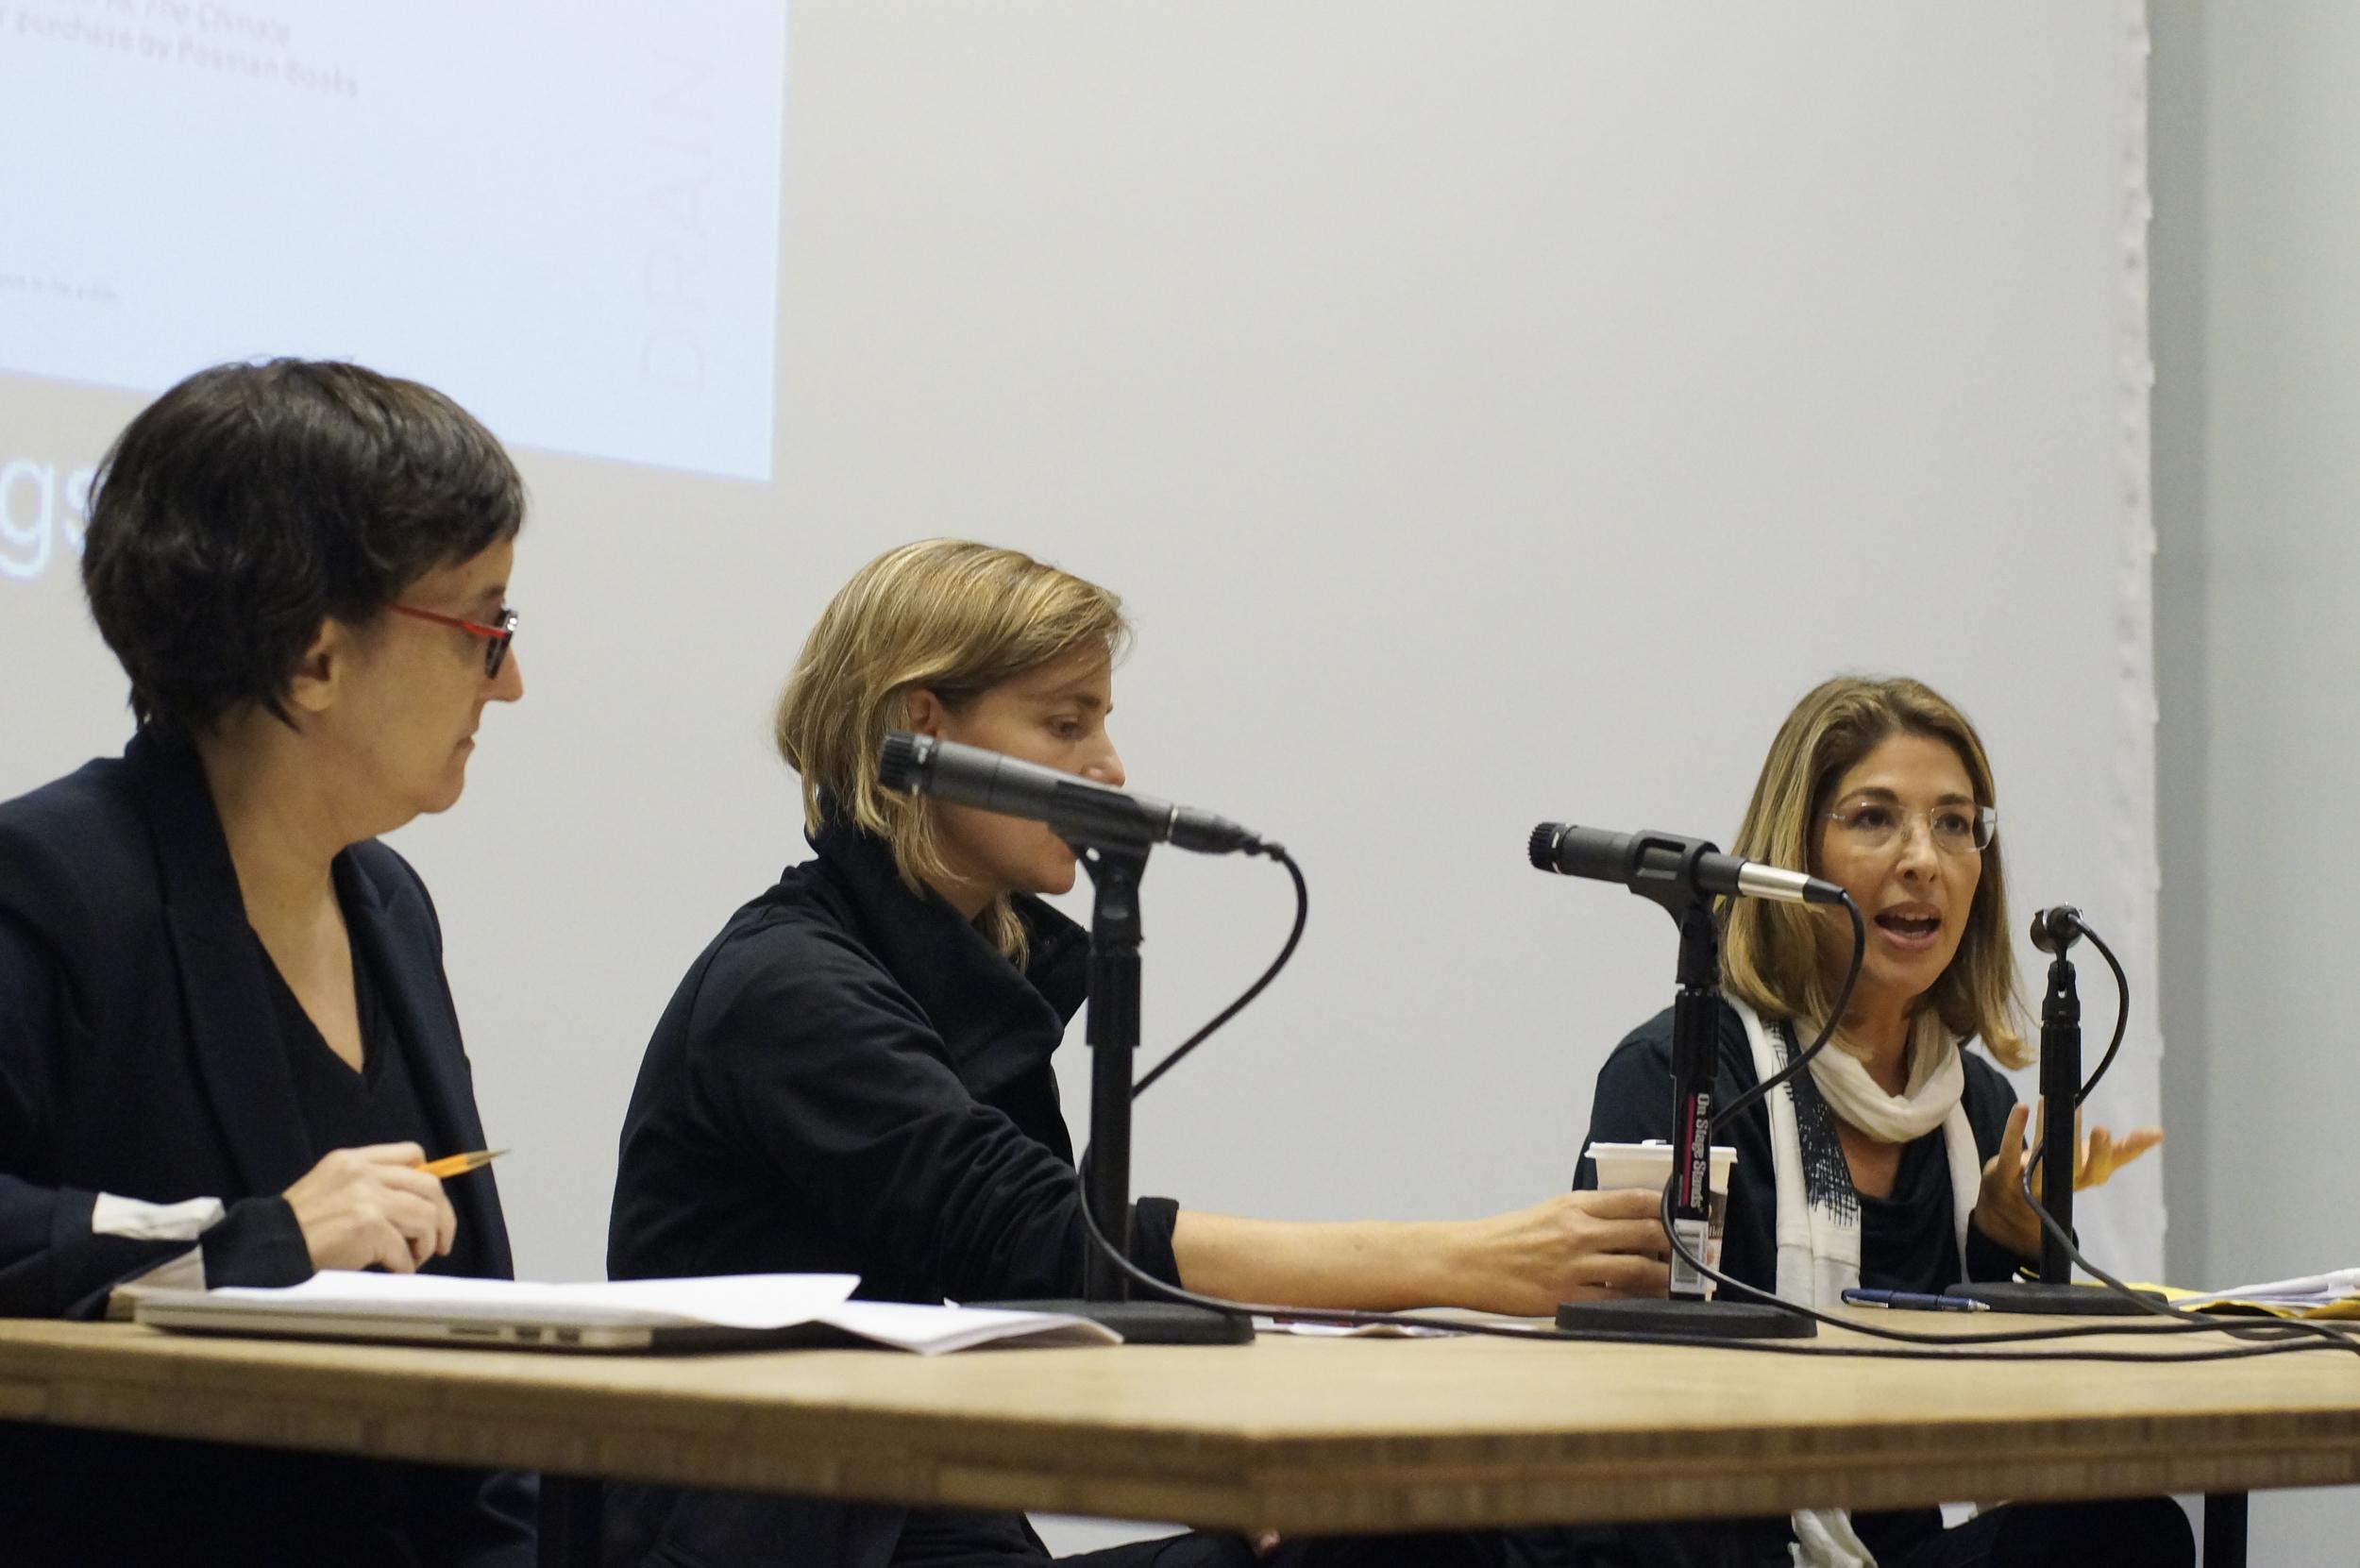 Laura Kurgan, Kate Orff, and Naomi Klein discuss planning for climate change, September 24, 2014, Wood Auditorium, Columbia University.